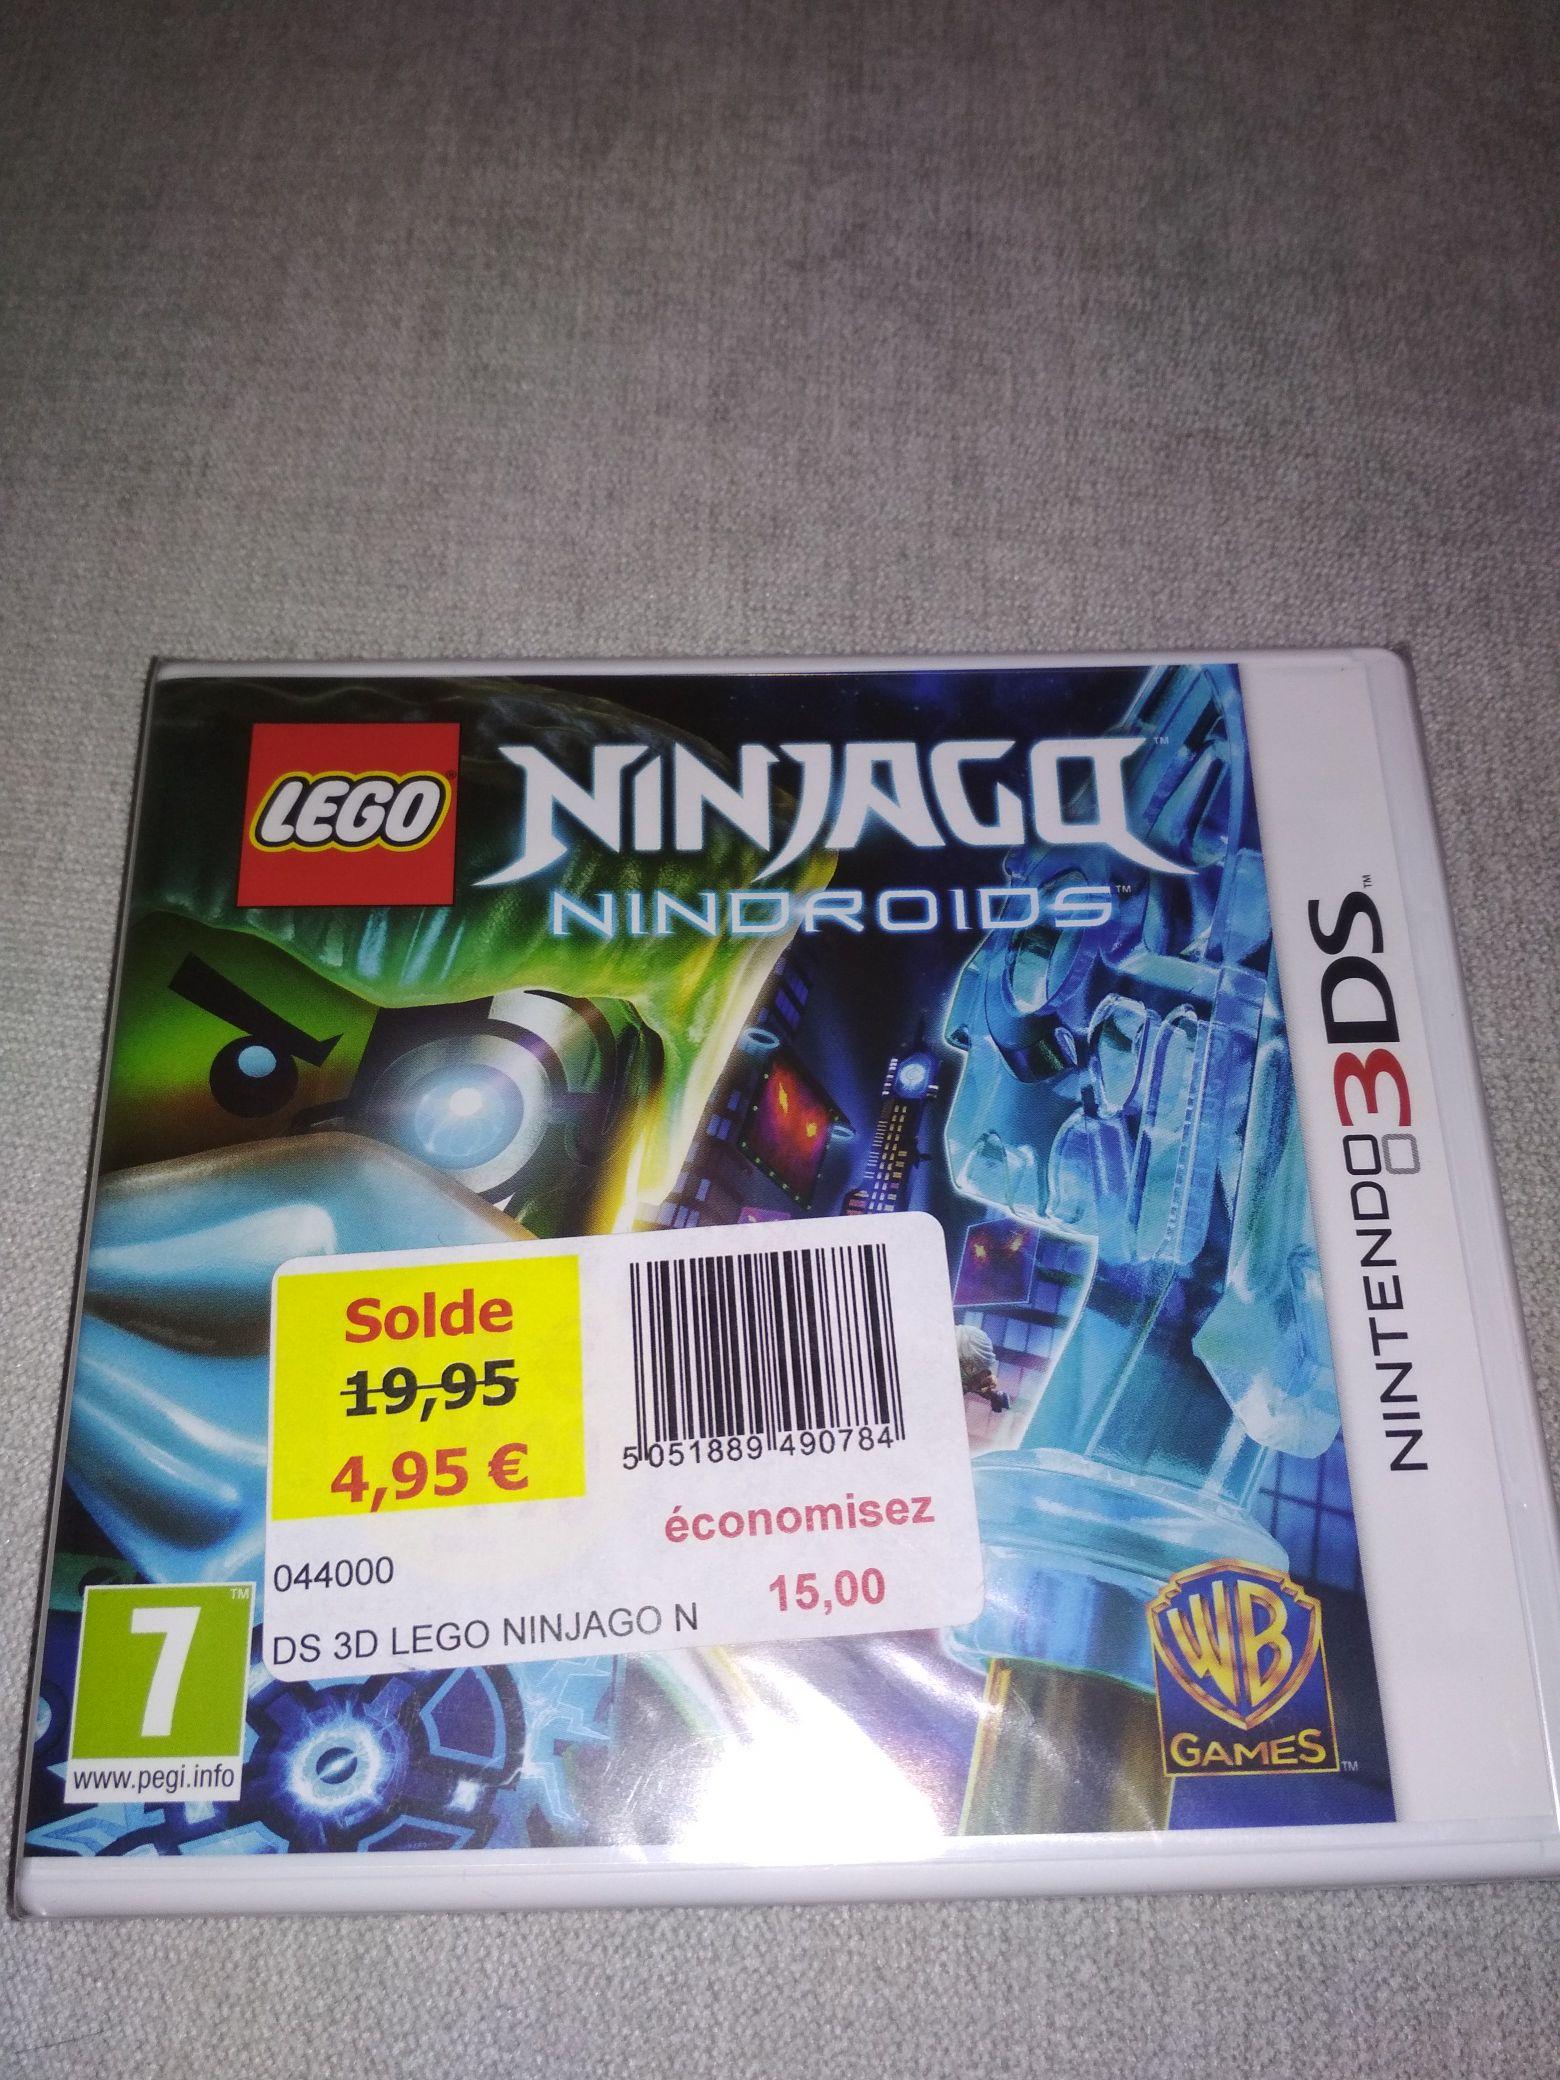 Lego Ninjago Nindroids sur Nintendo 3DS - Saran (45)